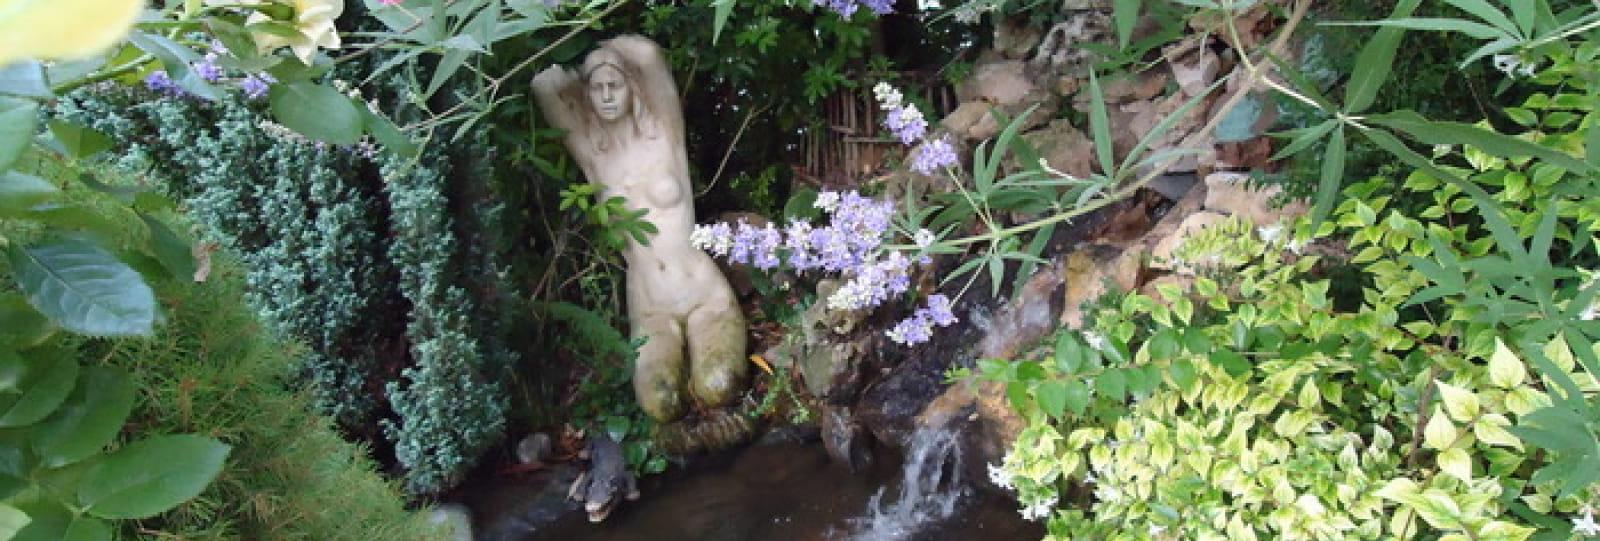 Jardin Le clos fleuri